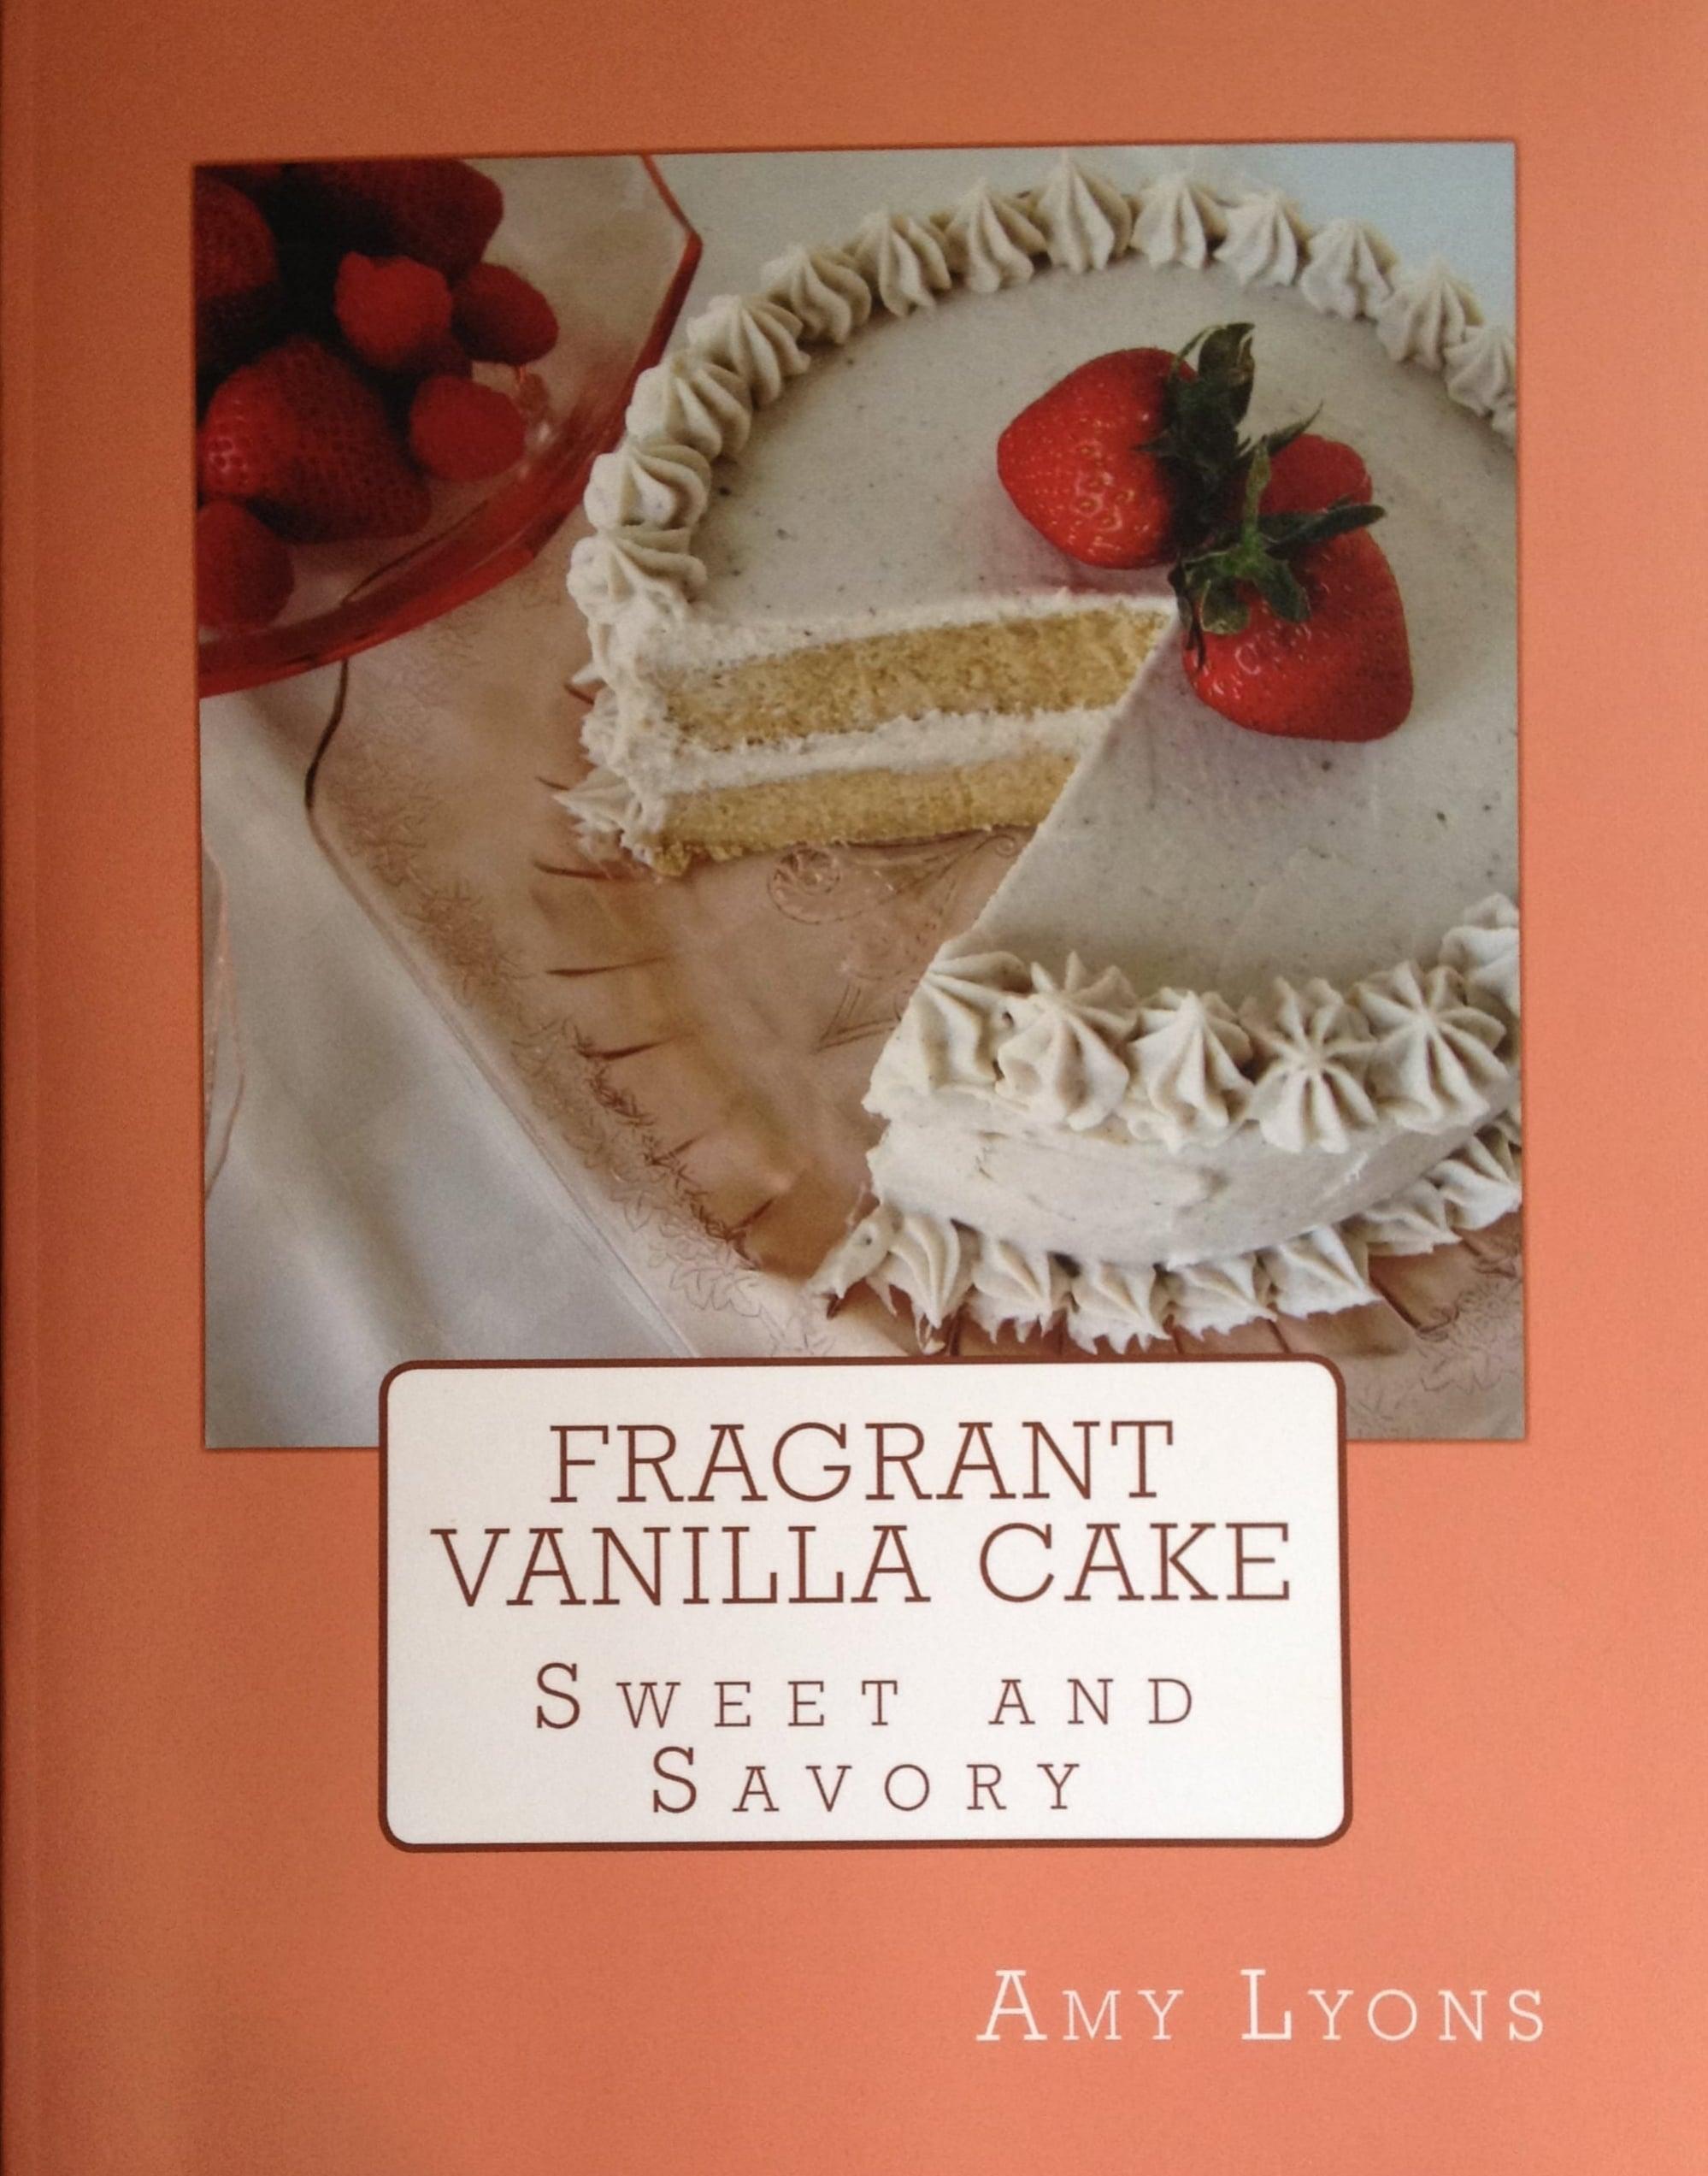 My Favorite Vegan Cookbooks! Fragrant Vanilla Cake.  www.tammyblomsterberg.com